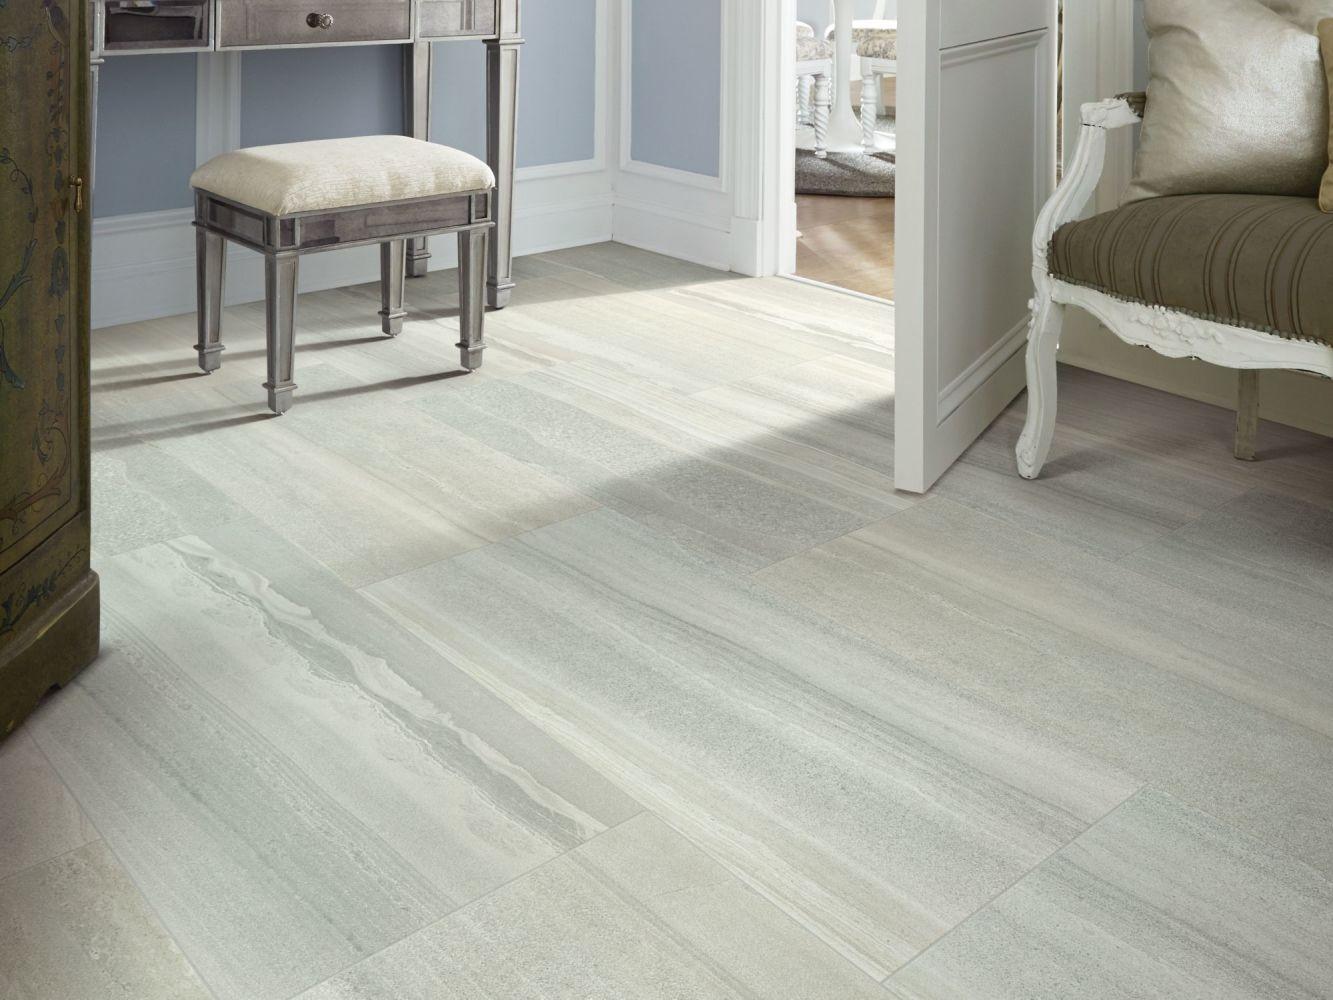 Shaw Floors SFA Origin 12×24 Lithium 00560_SA933